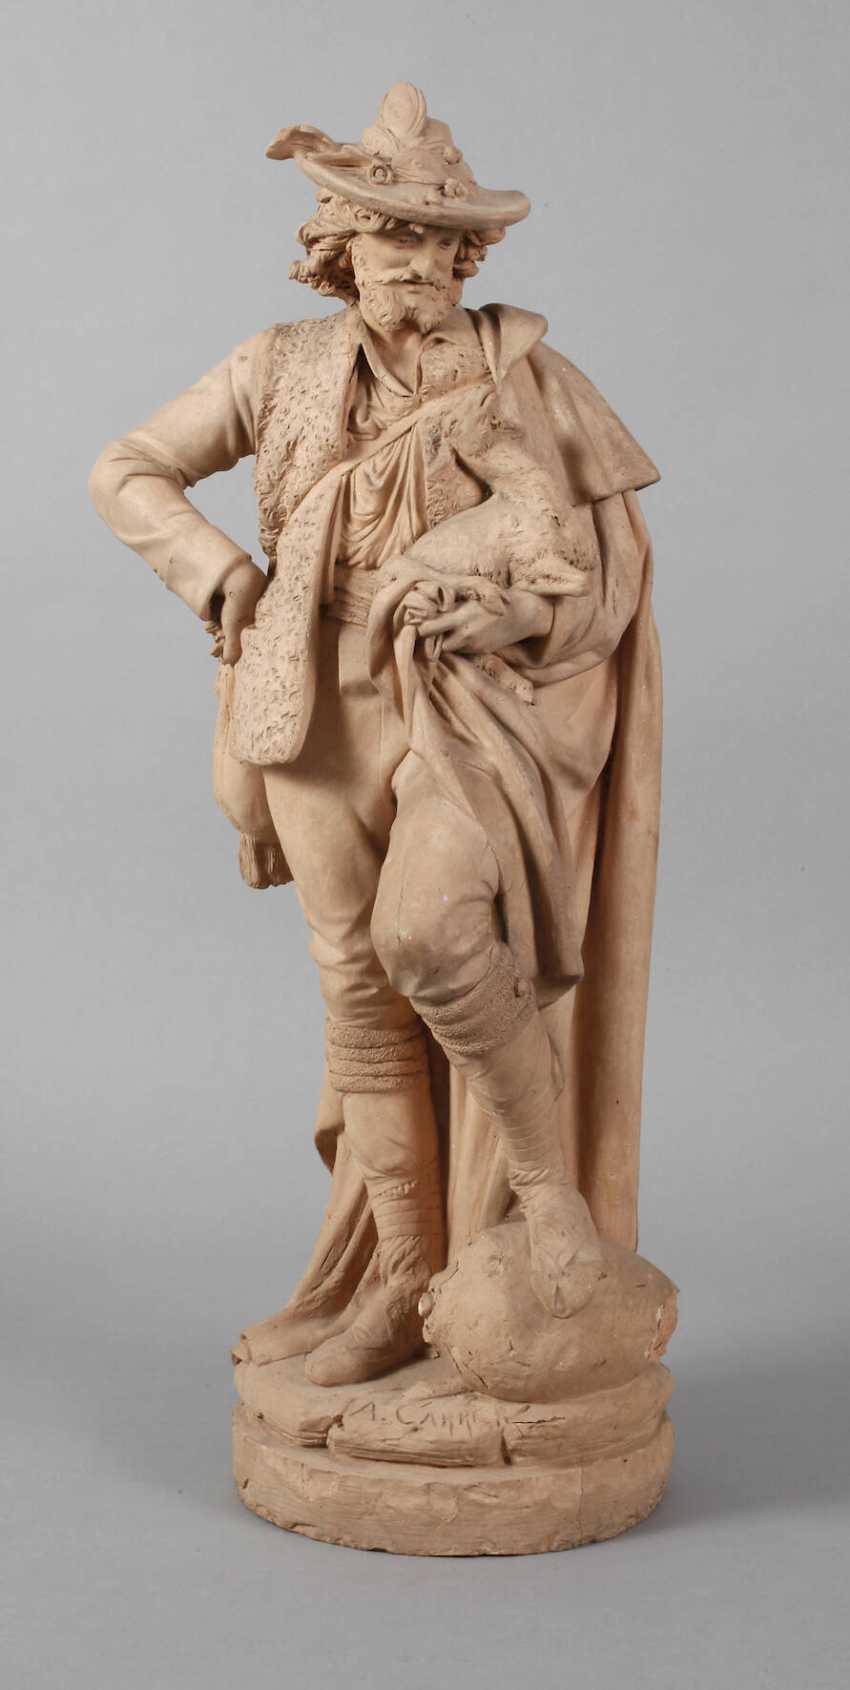 Albert-Ernest Carrier-Belleuse, large salon figure - photo 1